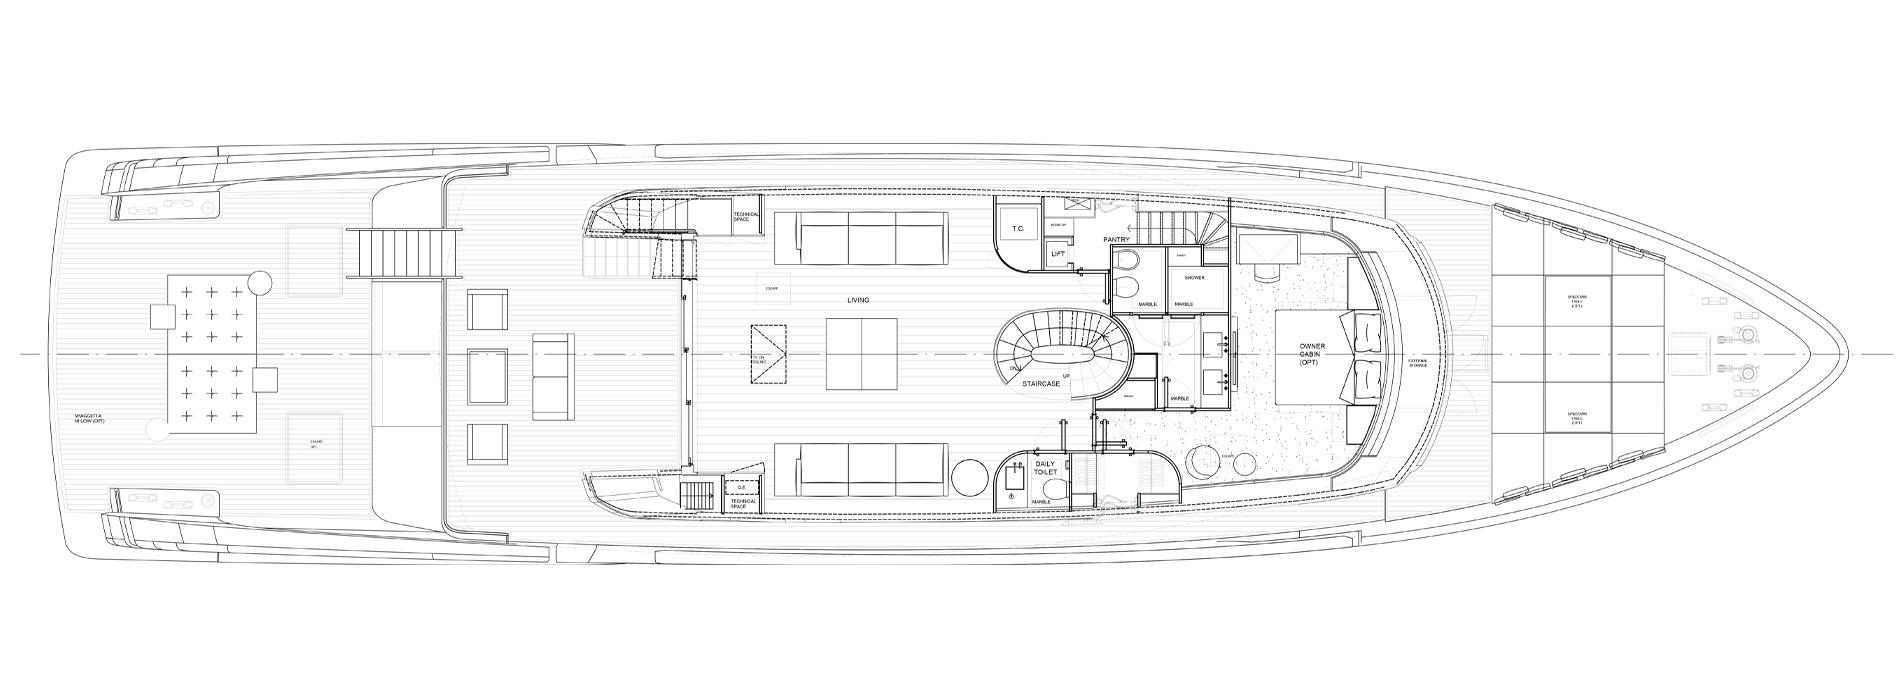 Sanlorenzo Yachts SX112 Главная палуба  версия C